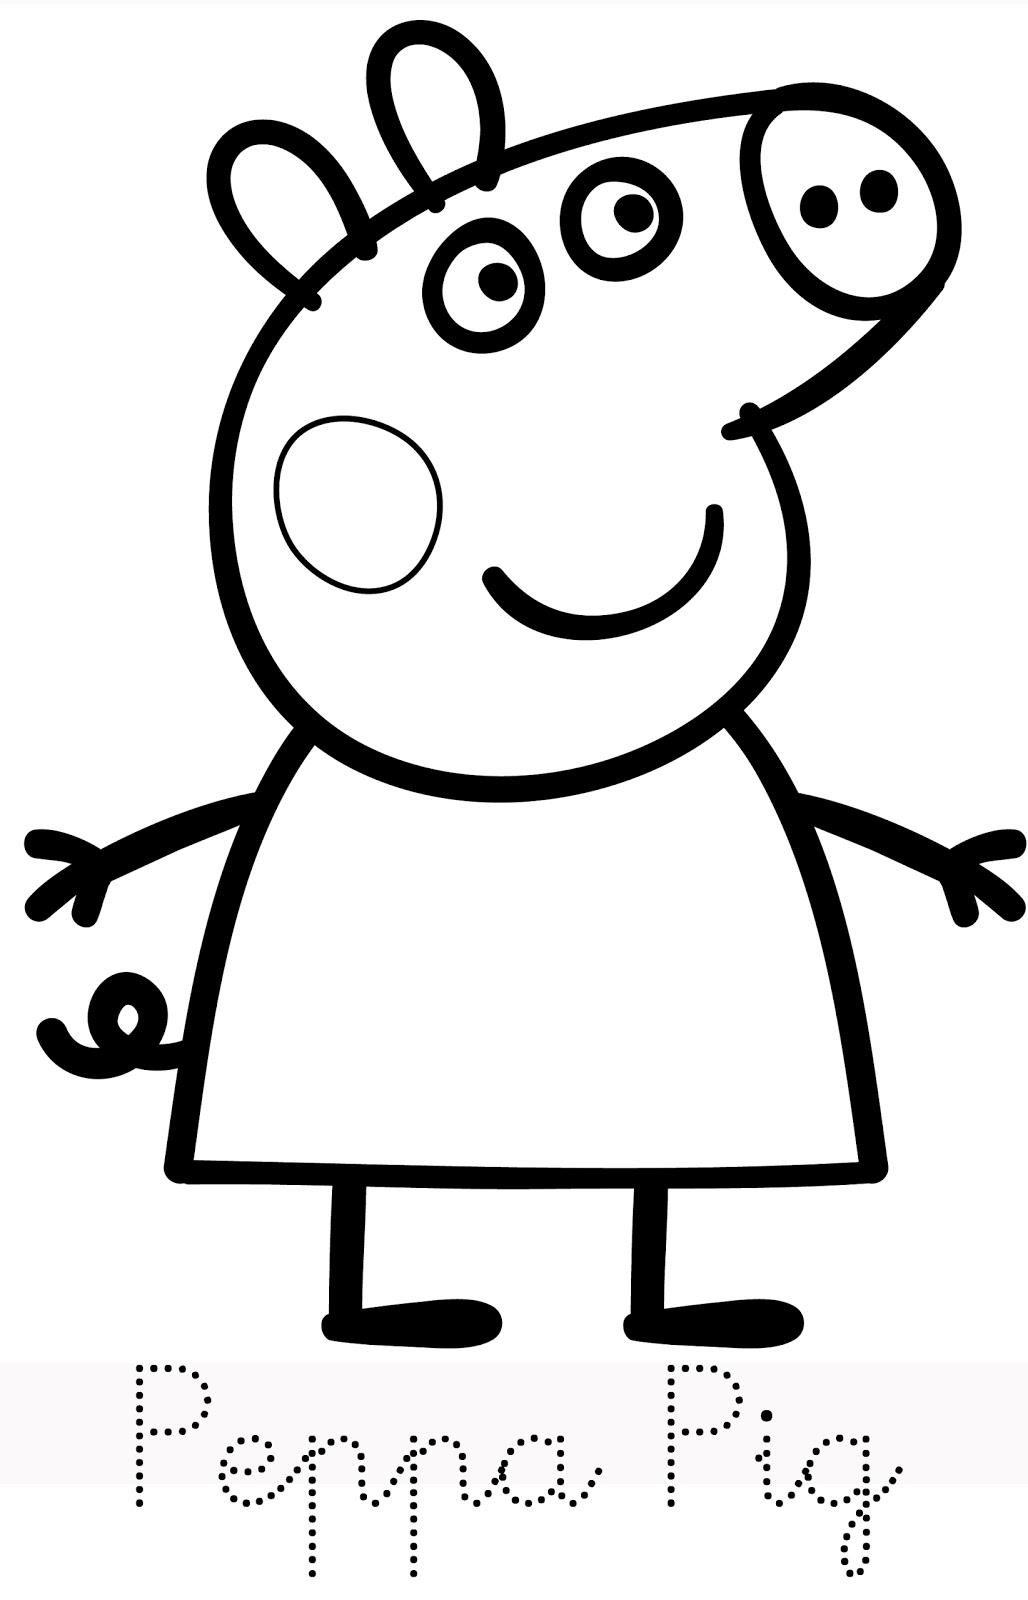 Baby Potatoes Family Of Peppa Pig